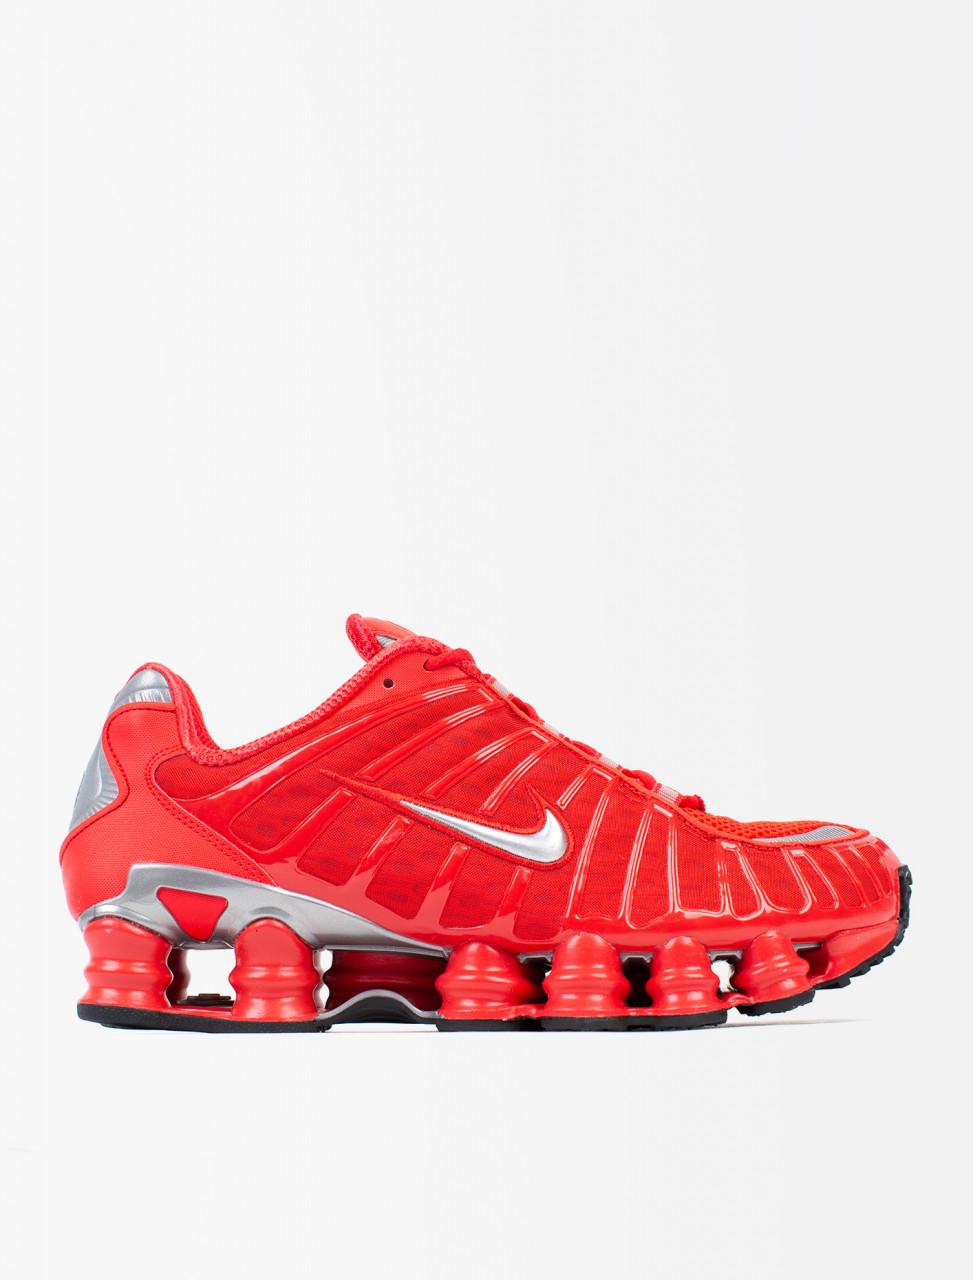 official photos 1293b 9905d Nike Shox TL Sneaker